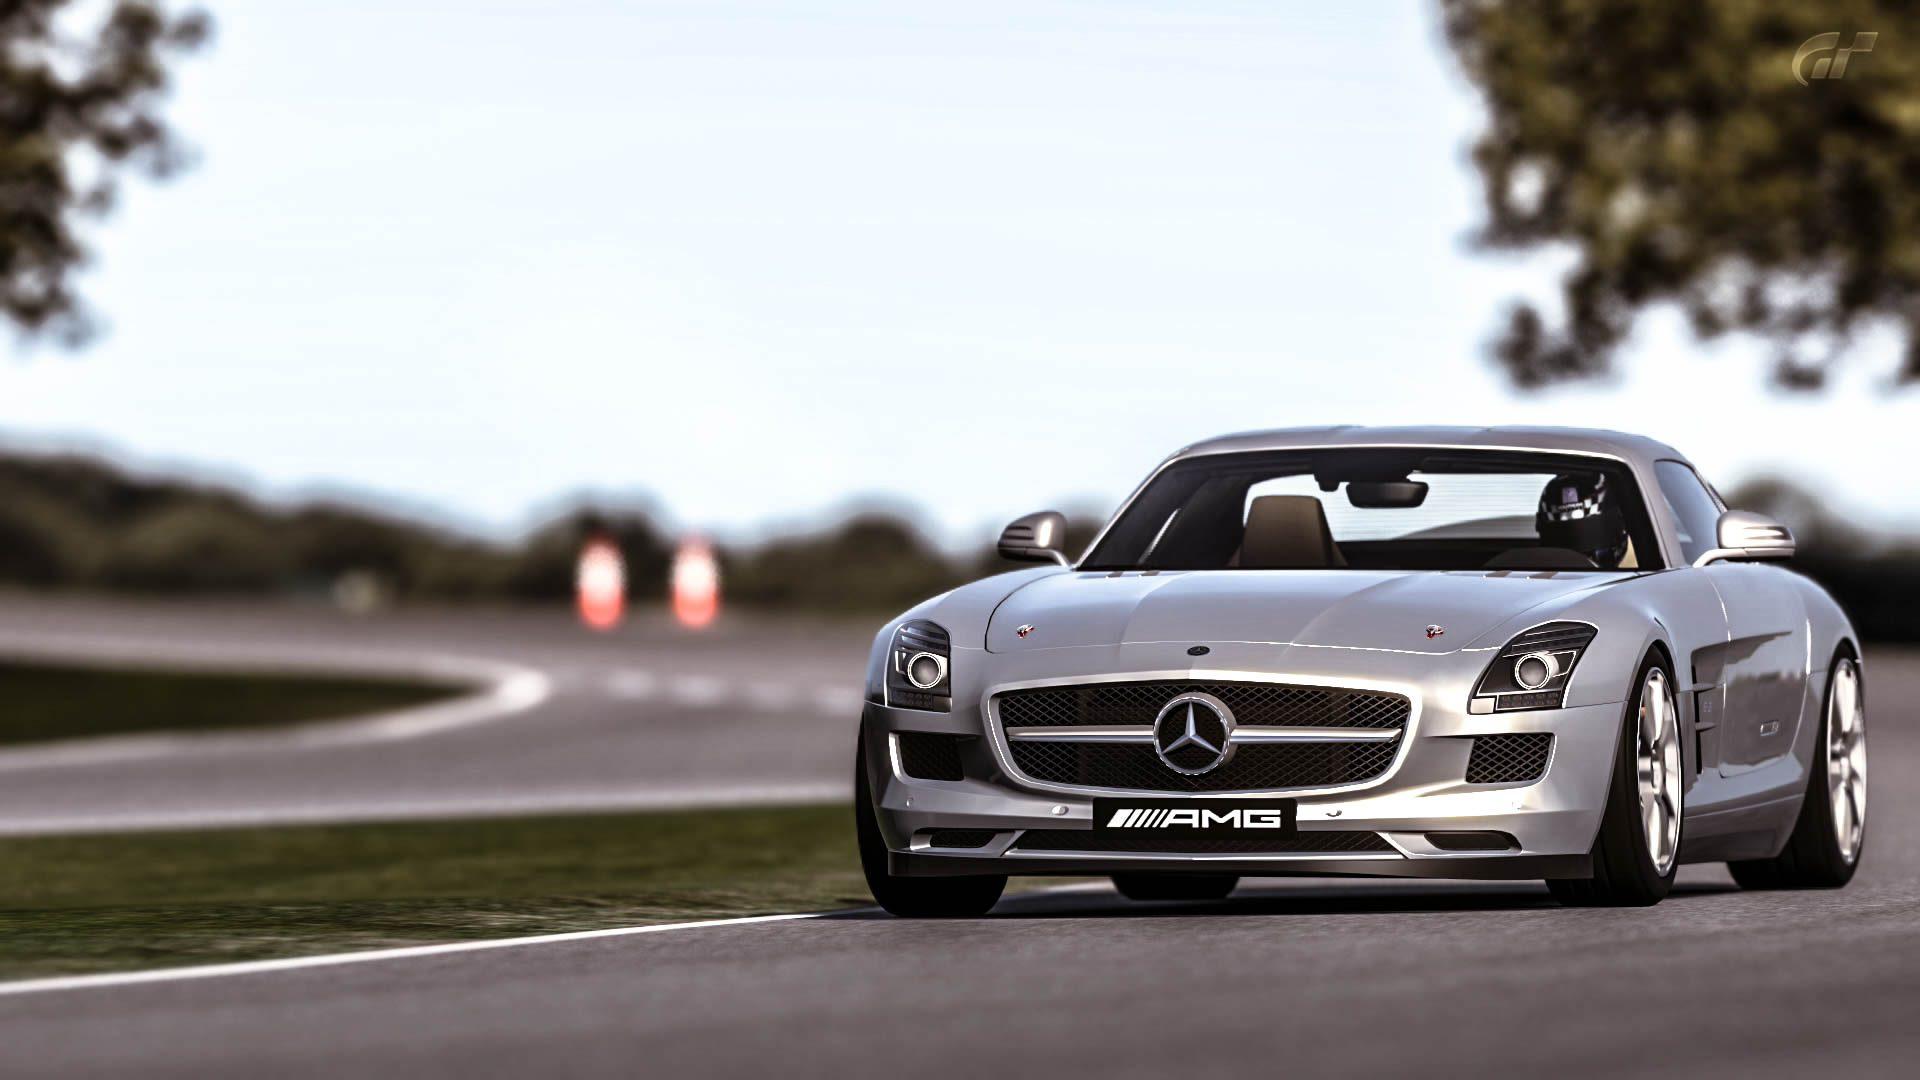 Mercedes_SLS_AMG_01.jpg